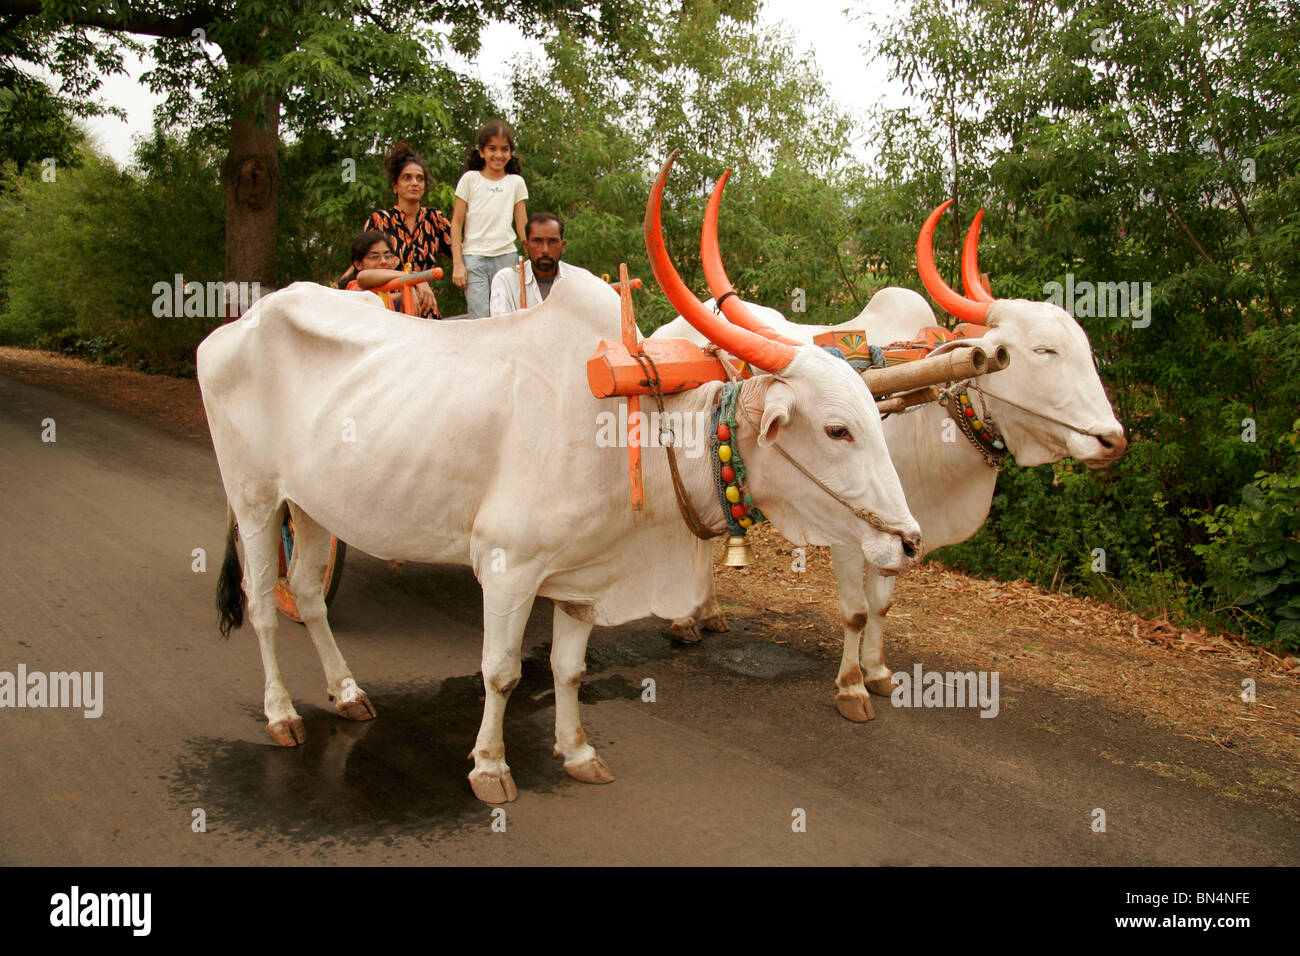 South Asian Indian mother and daughters enjoying bullock cart ride ; Wai; Maharashtra ; India MR# 645;189;191 - Stock Image